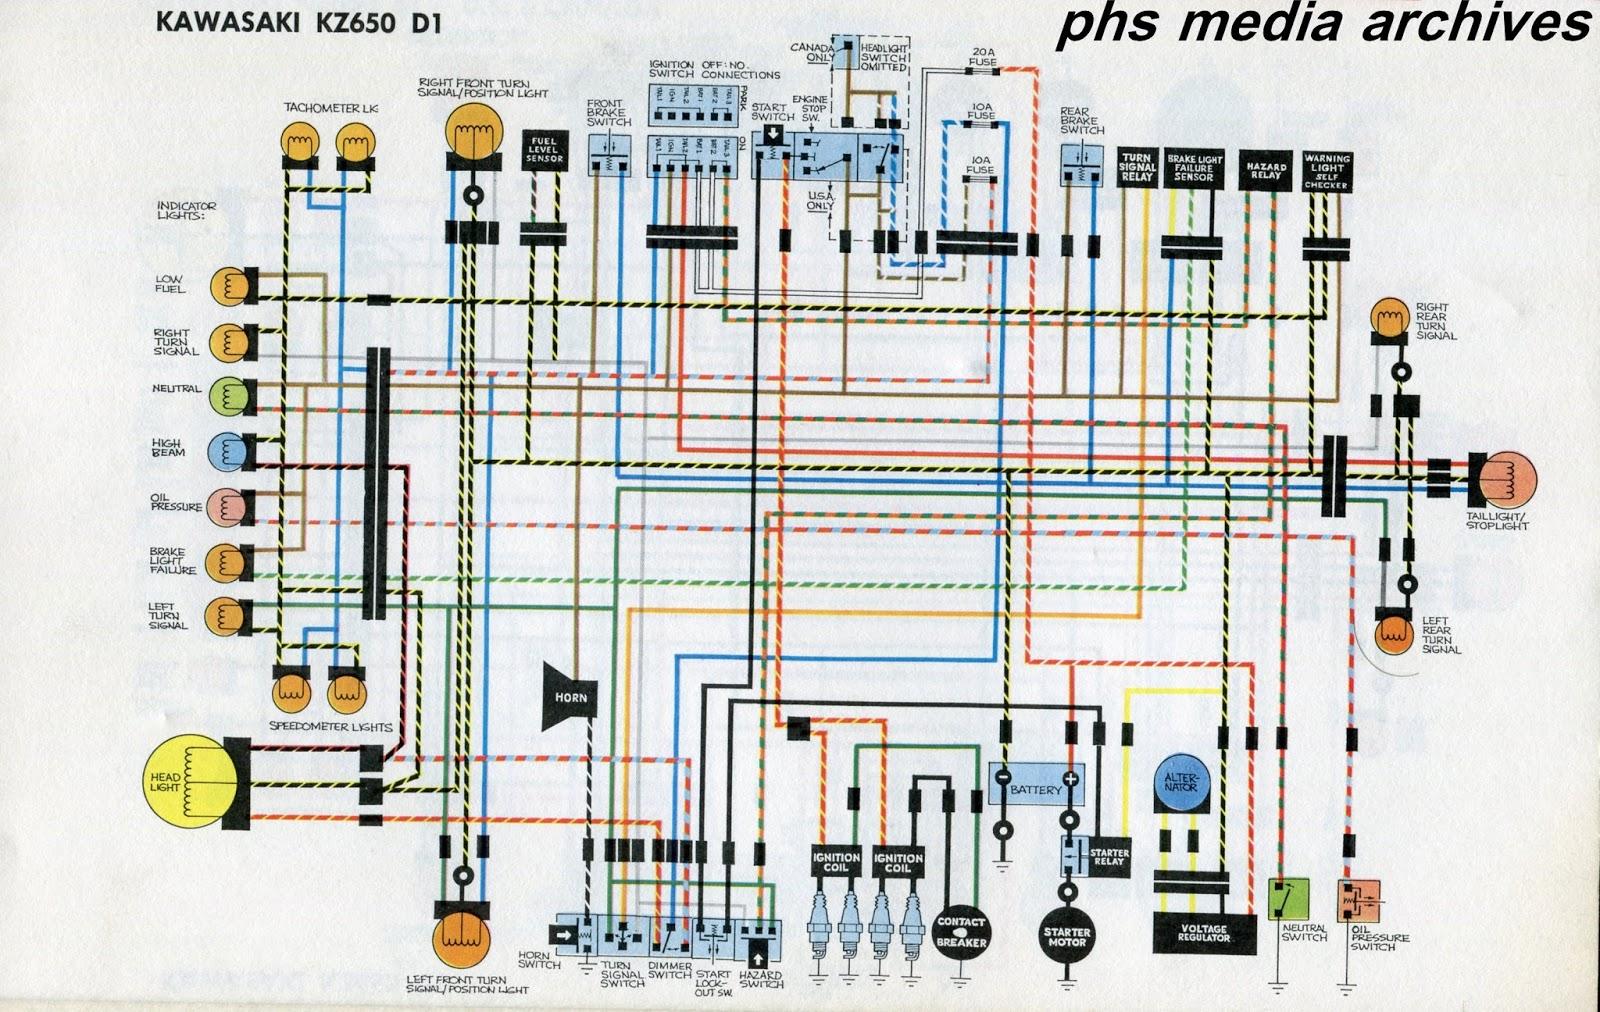 small resolution of bobber kz650 wiring diagram wiring diagram advancekz650 wiring diagram wiring diagram bobber kz650 wiring diagram